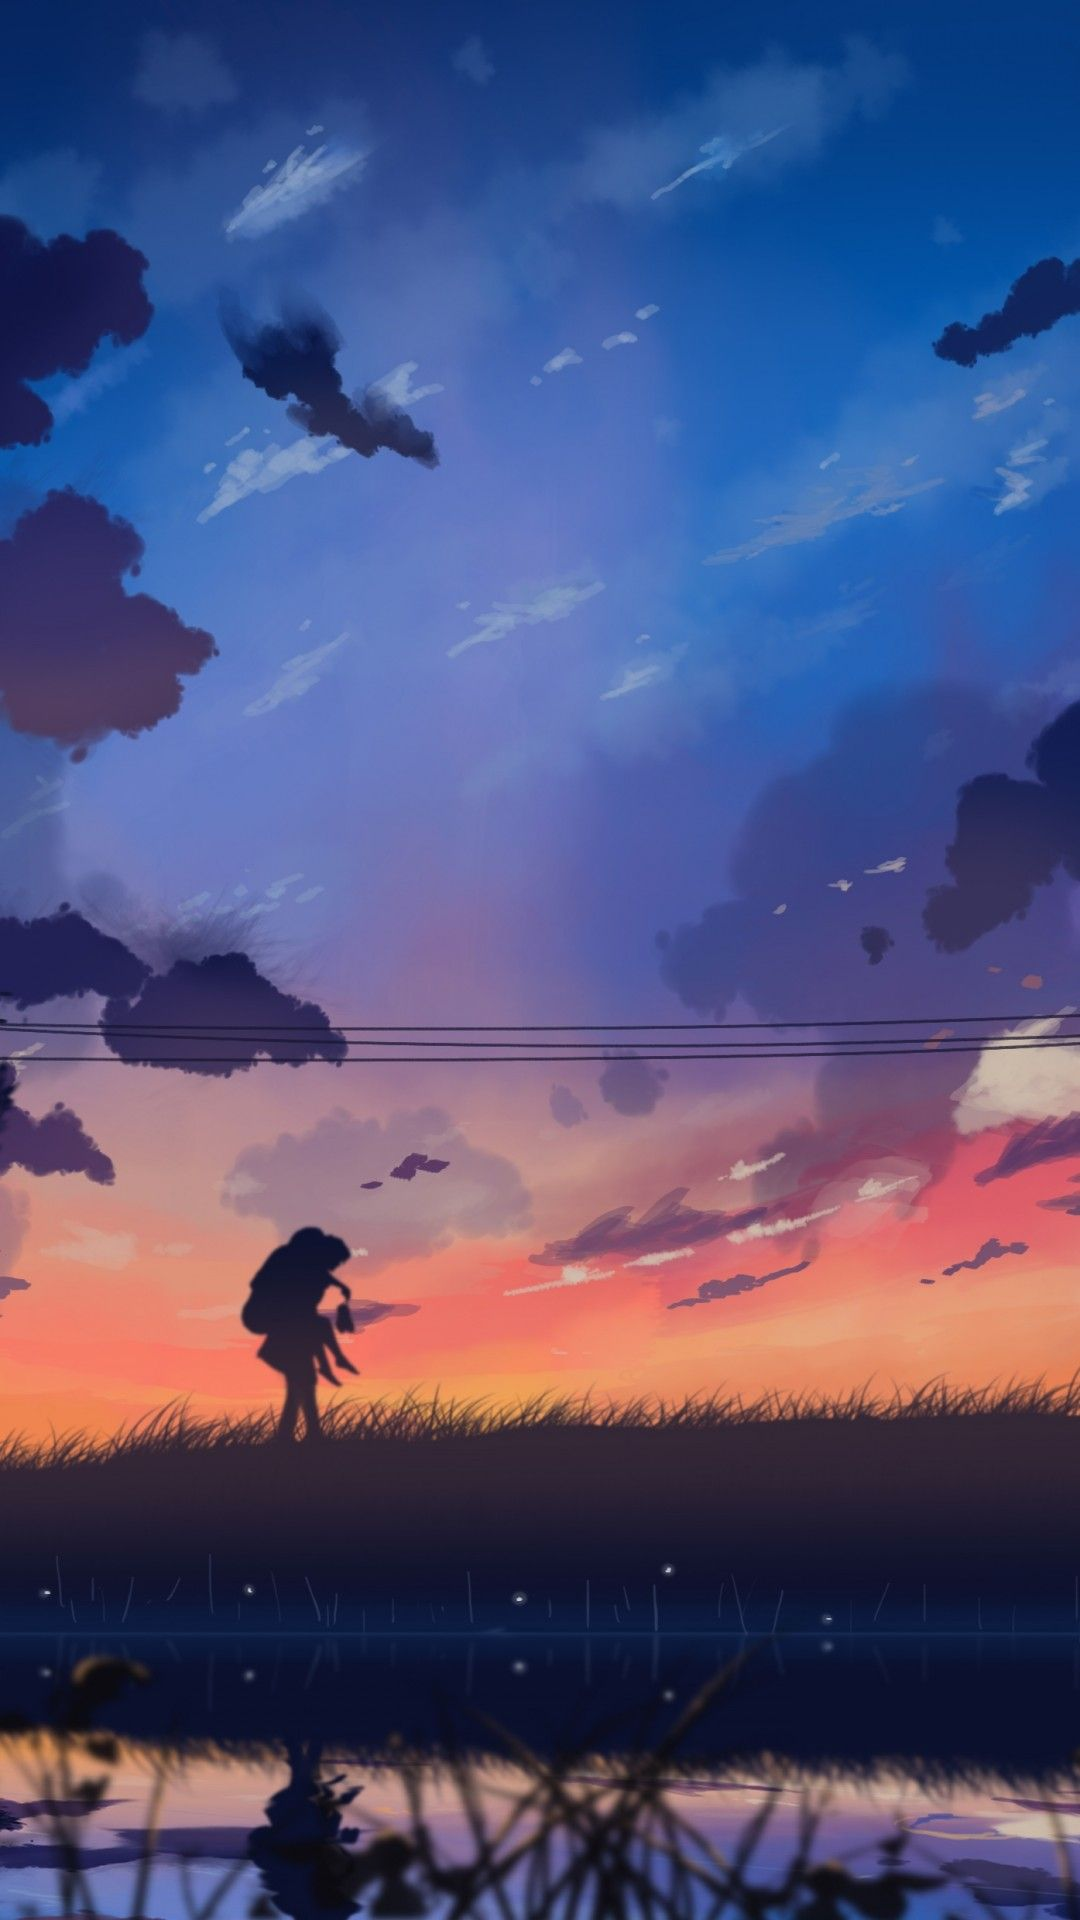 Anime HD Wallpaper Anime scenery, Anime scenery